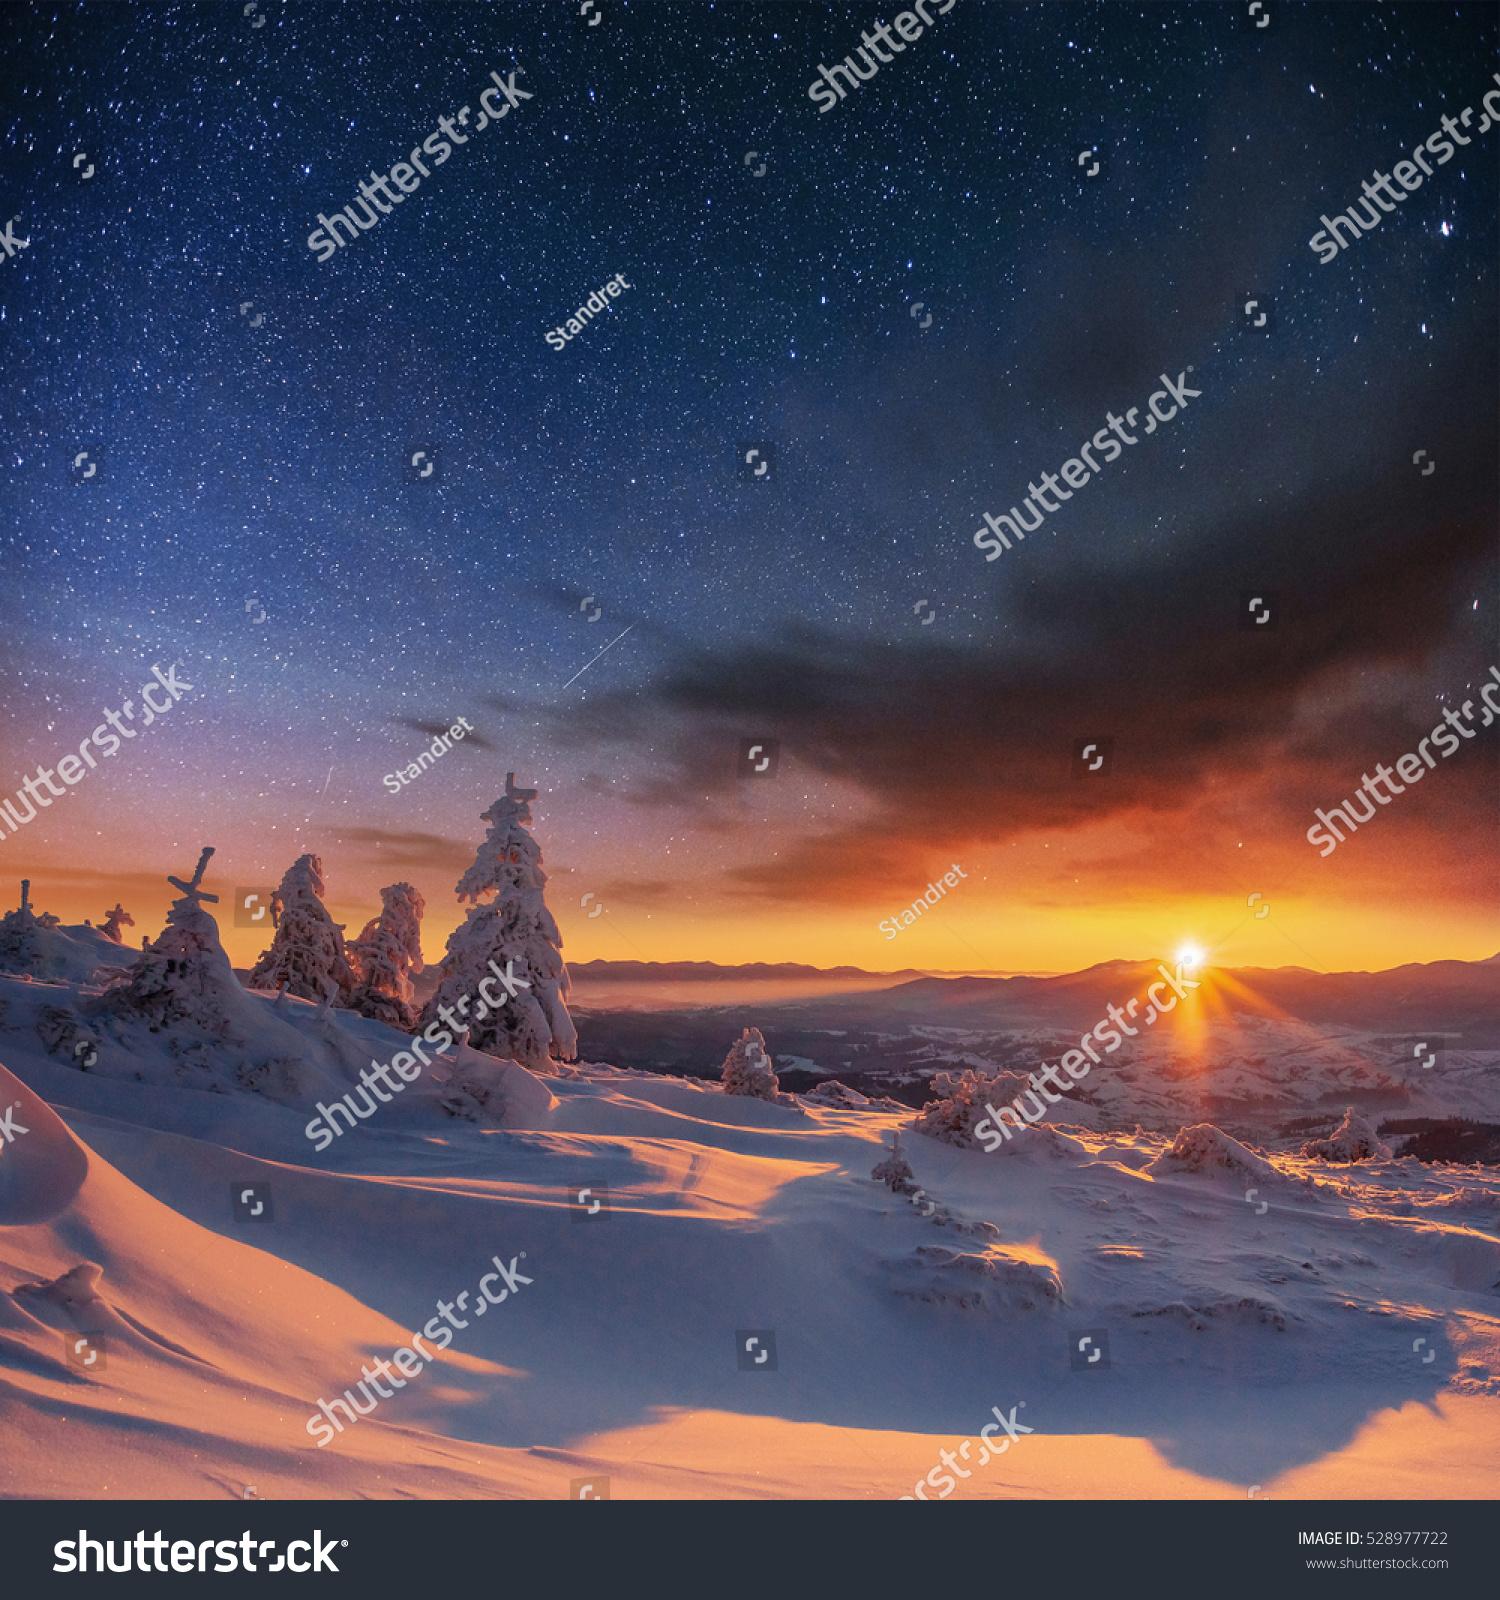 winter night boy kay boyle Winter night summary - kay boyle - masterplots ii: short story kay boyle's life.